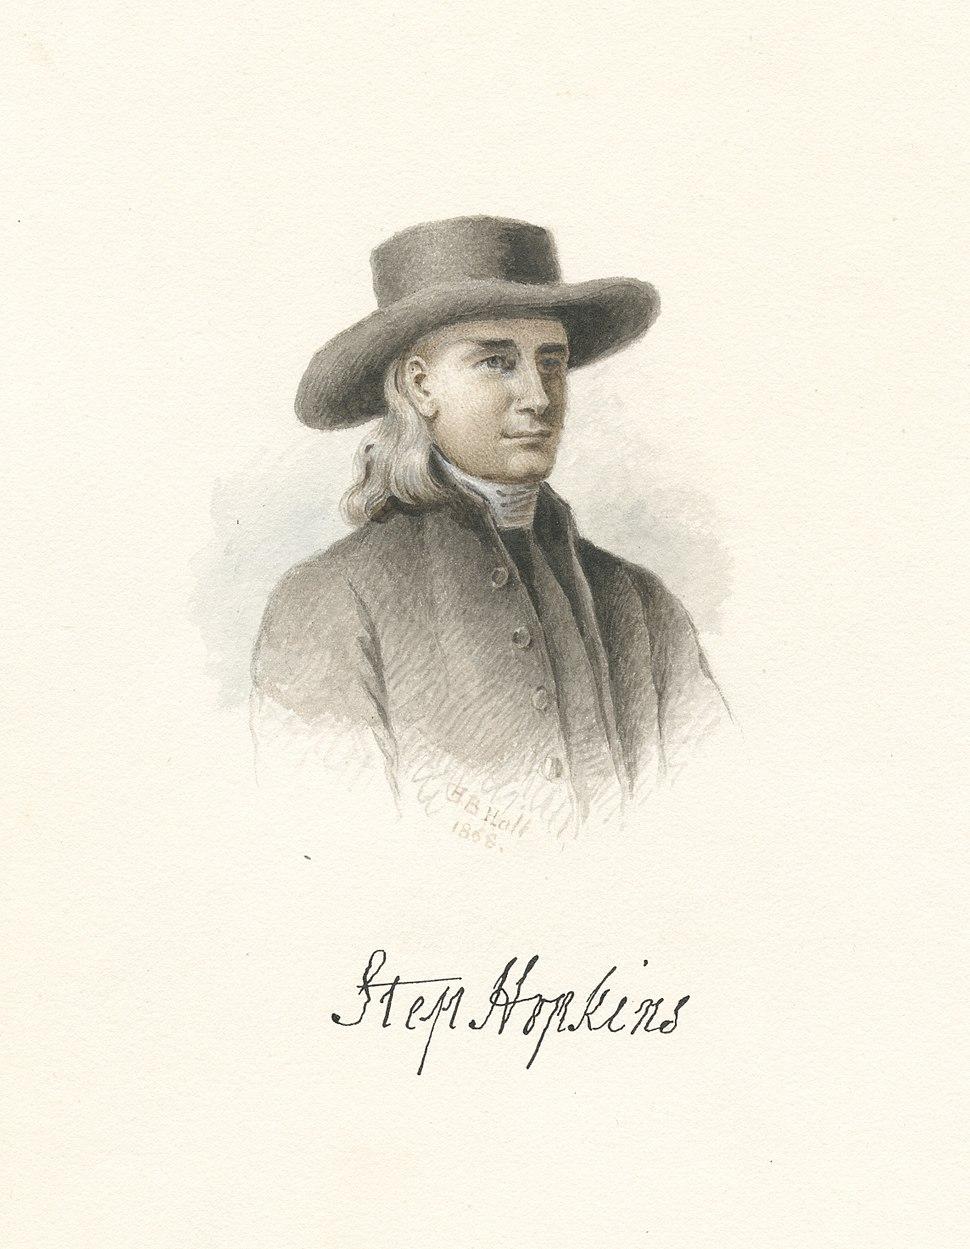 Stephen Hopkins (NYPL NYPG97-F76-420410)